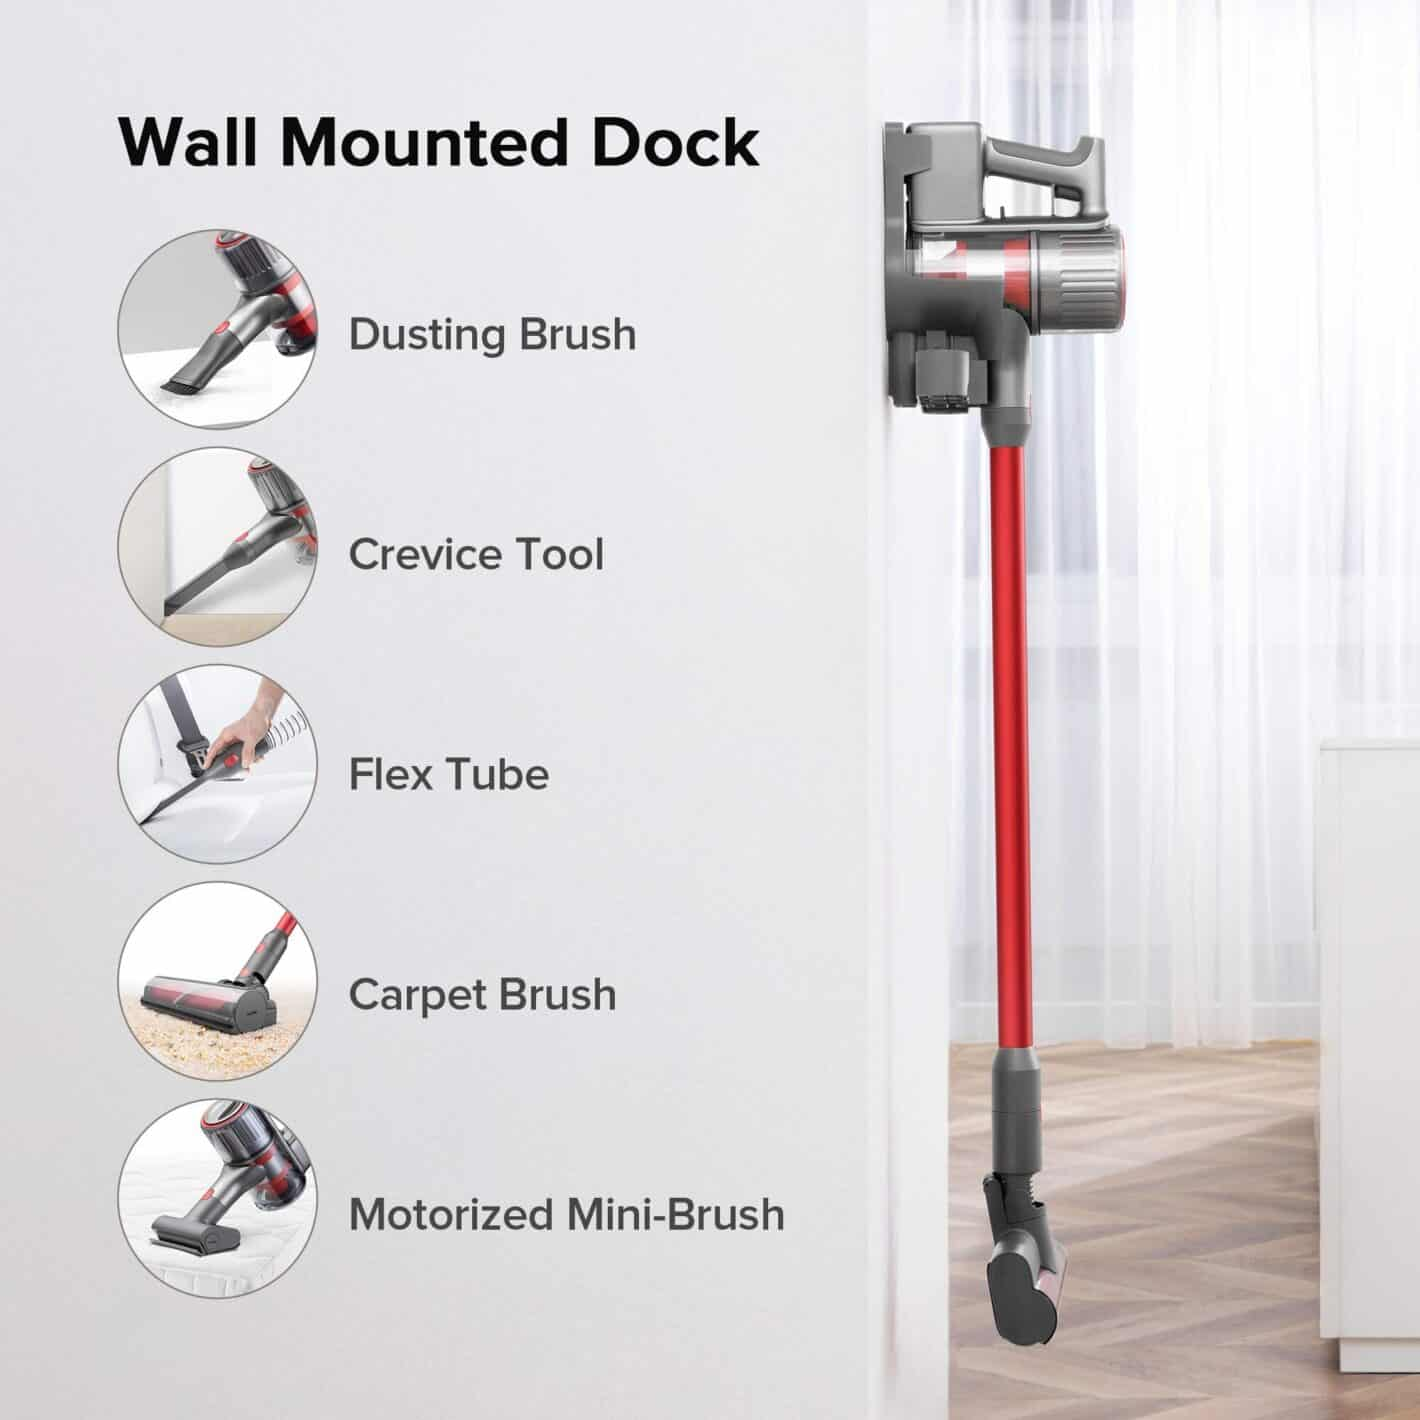 Roborock H7 Adapt Cordless Vacuum Wireless Handheld Vacuum Cleaner Carpet Portable Vacuum Cleaner 150AW Strong Power